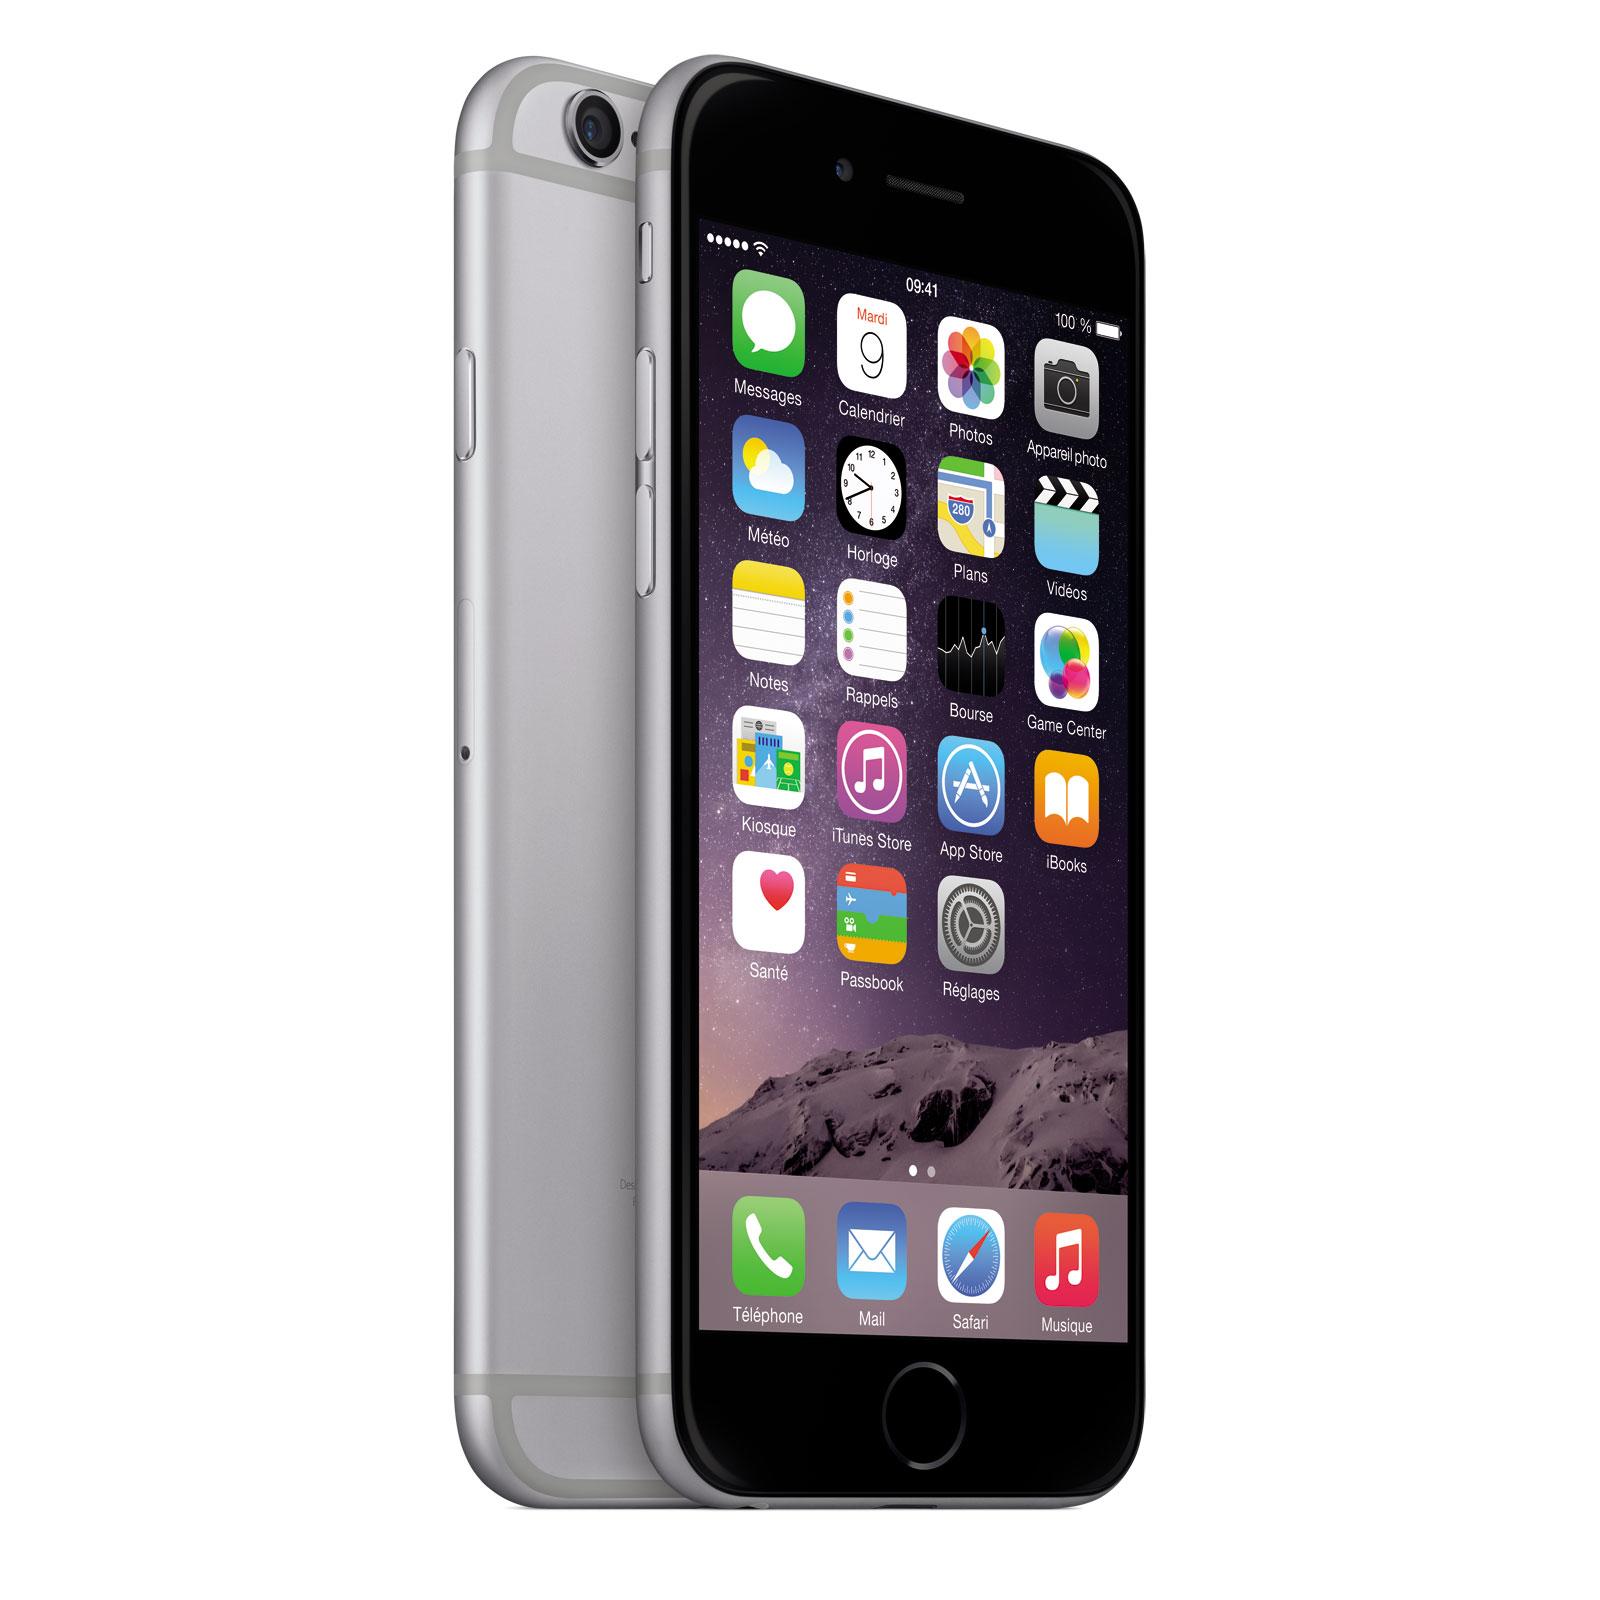 apple iphone 6 128 go gris sid ral mobile smartphone. Black Bedroom Furniture Sets. Home Design Ideas